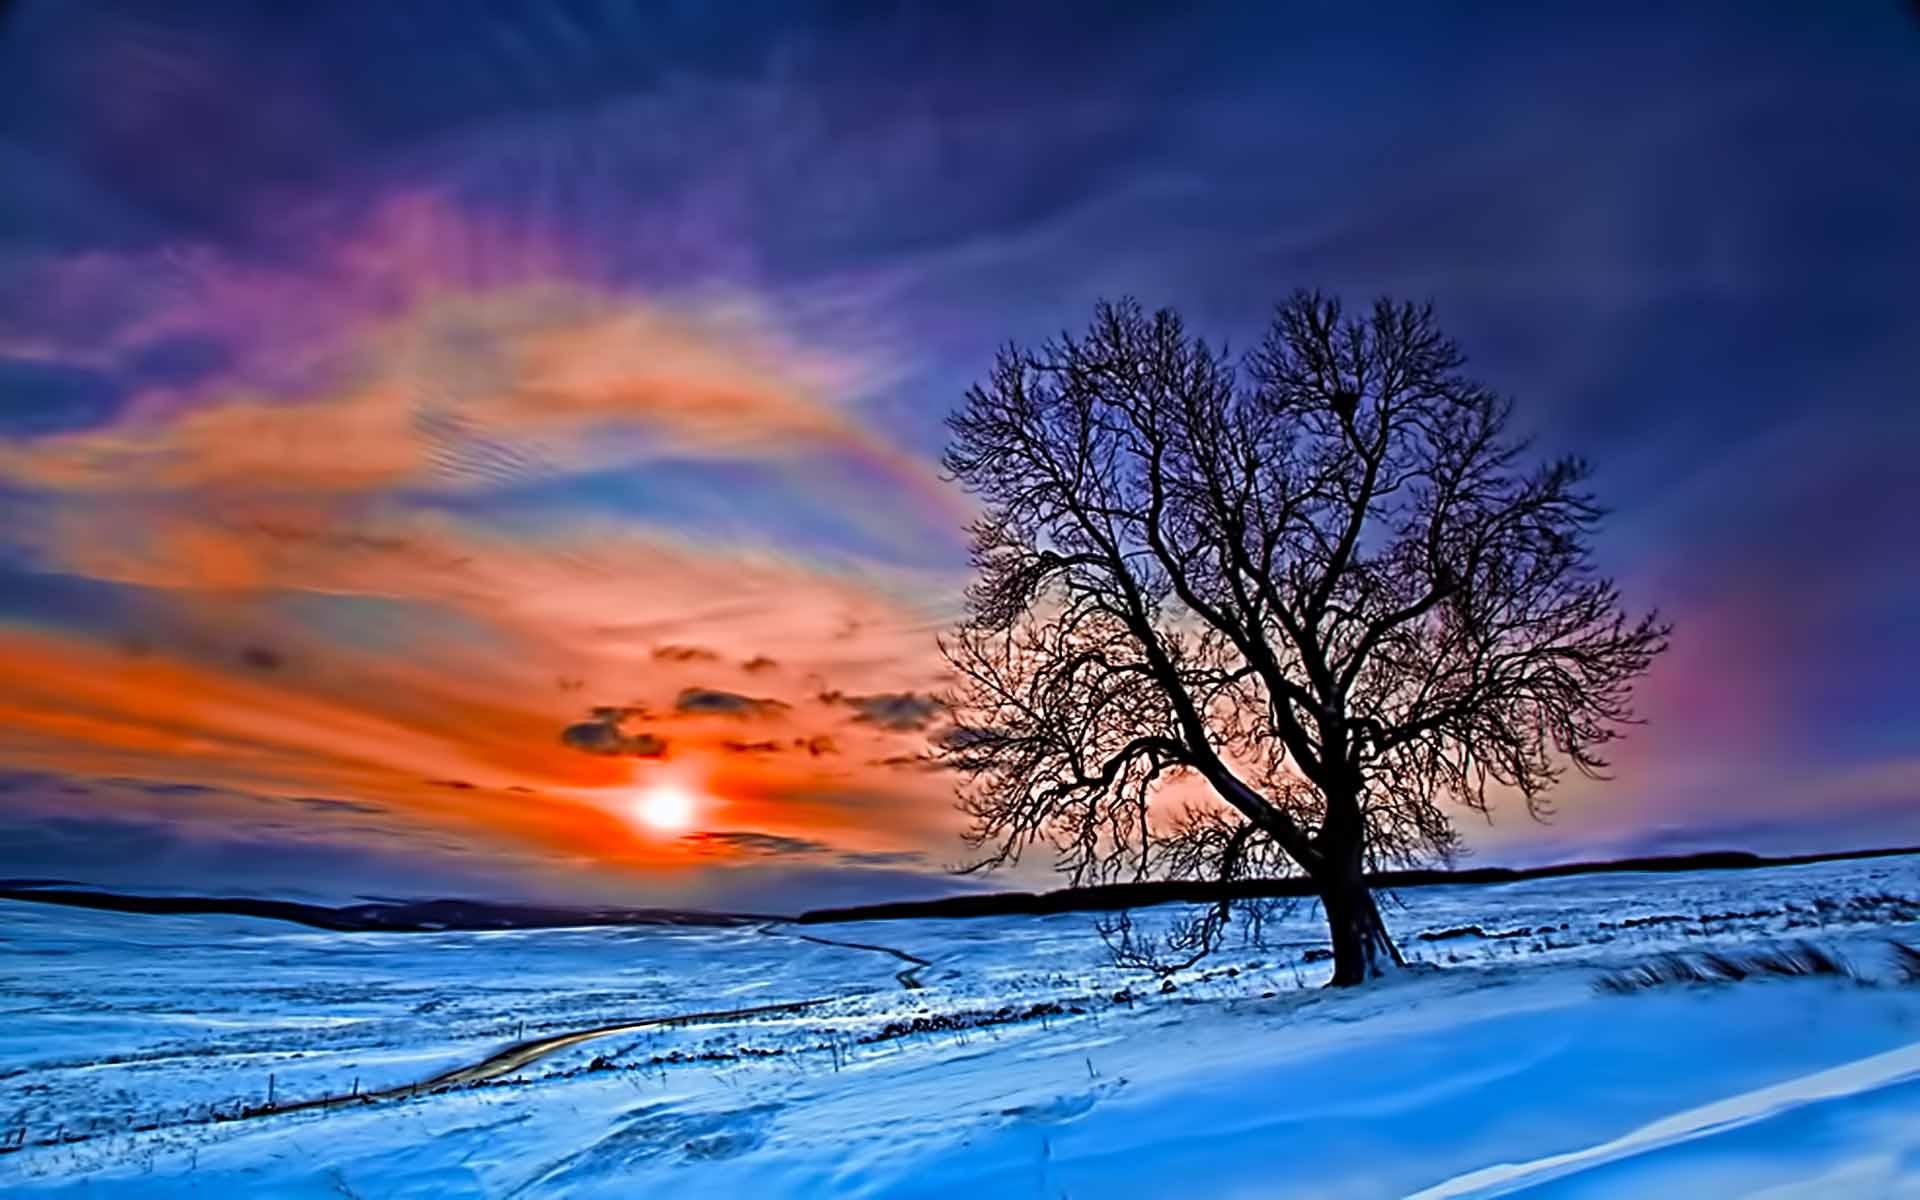 scenic winter beautiful wallpapers - photo #17